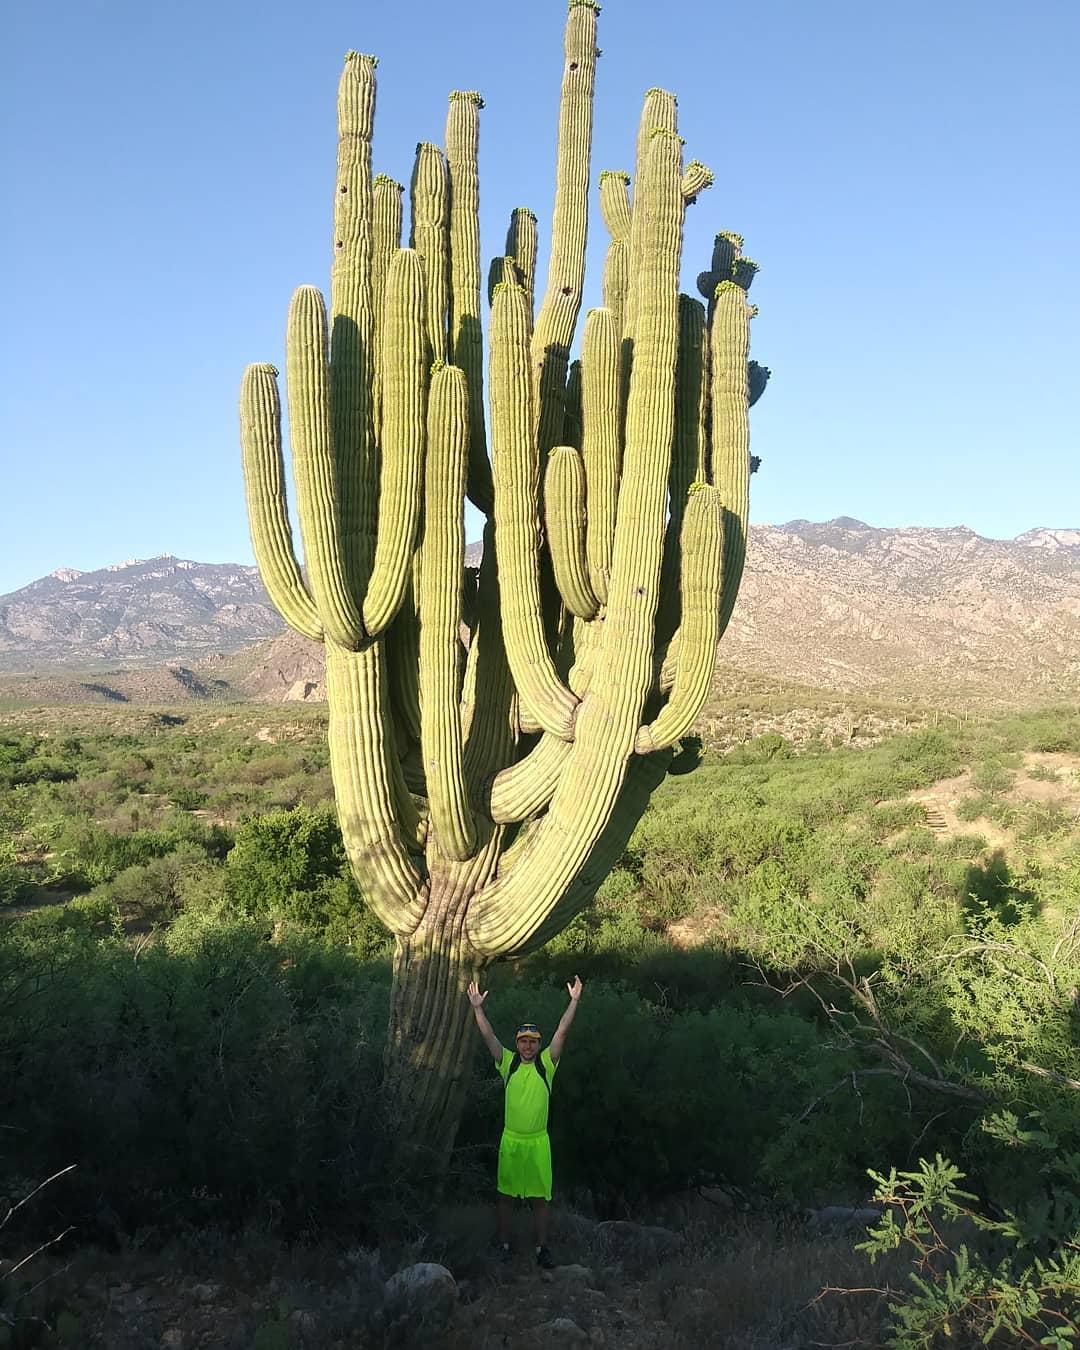 Huge Cactus Catalina State Park Tucson AZ